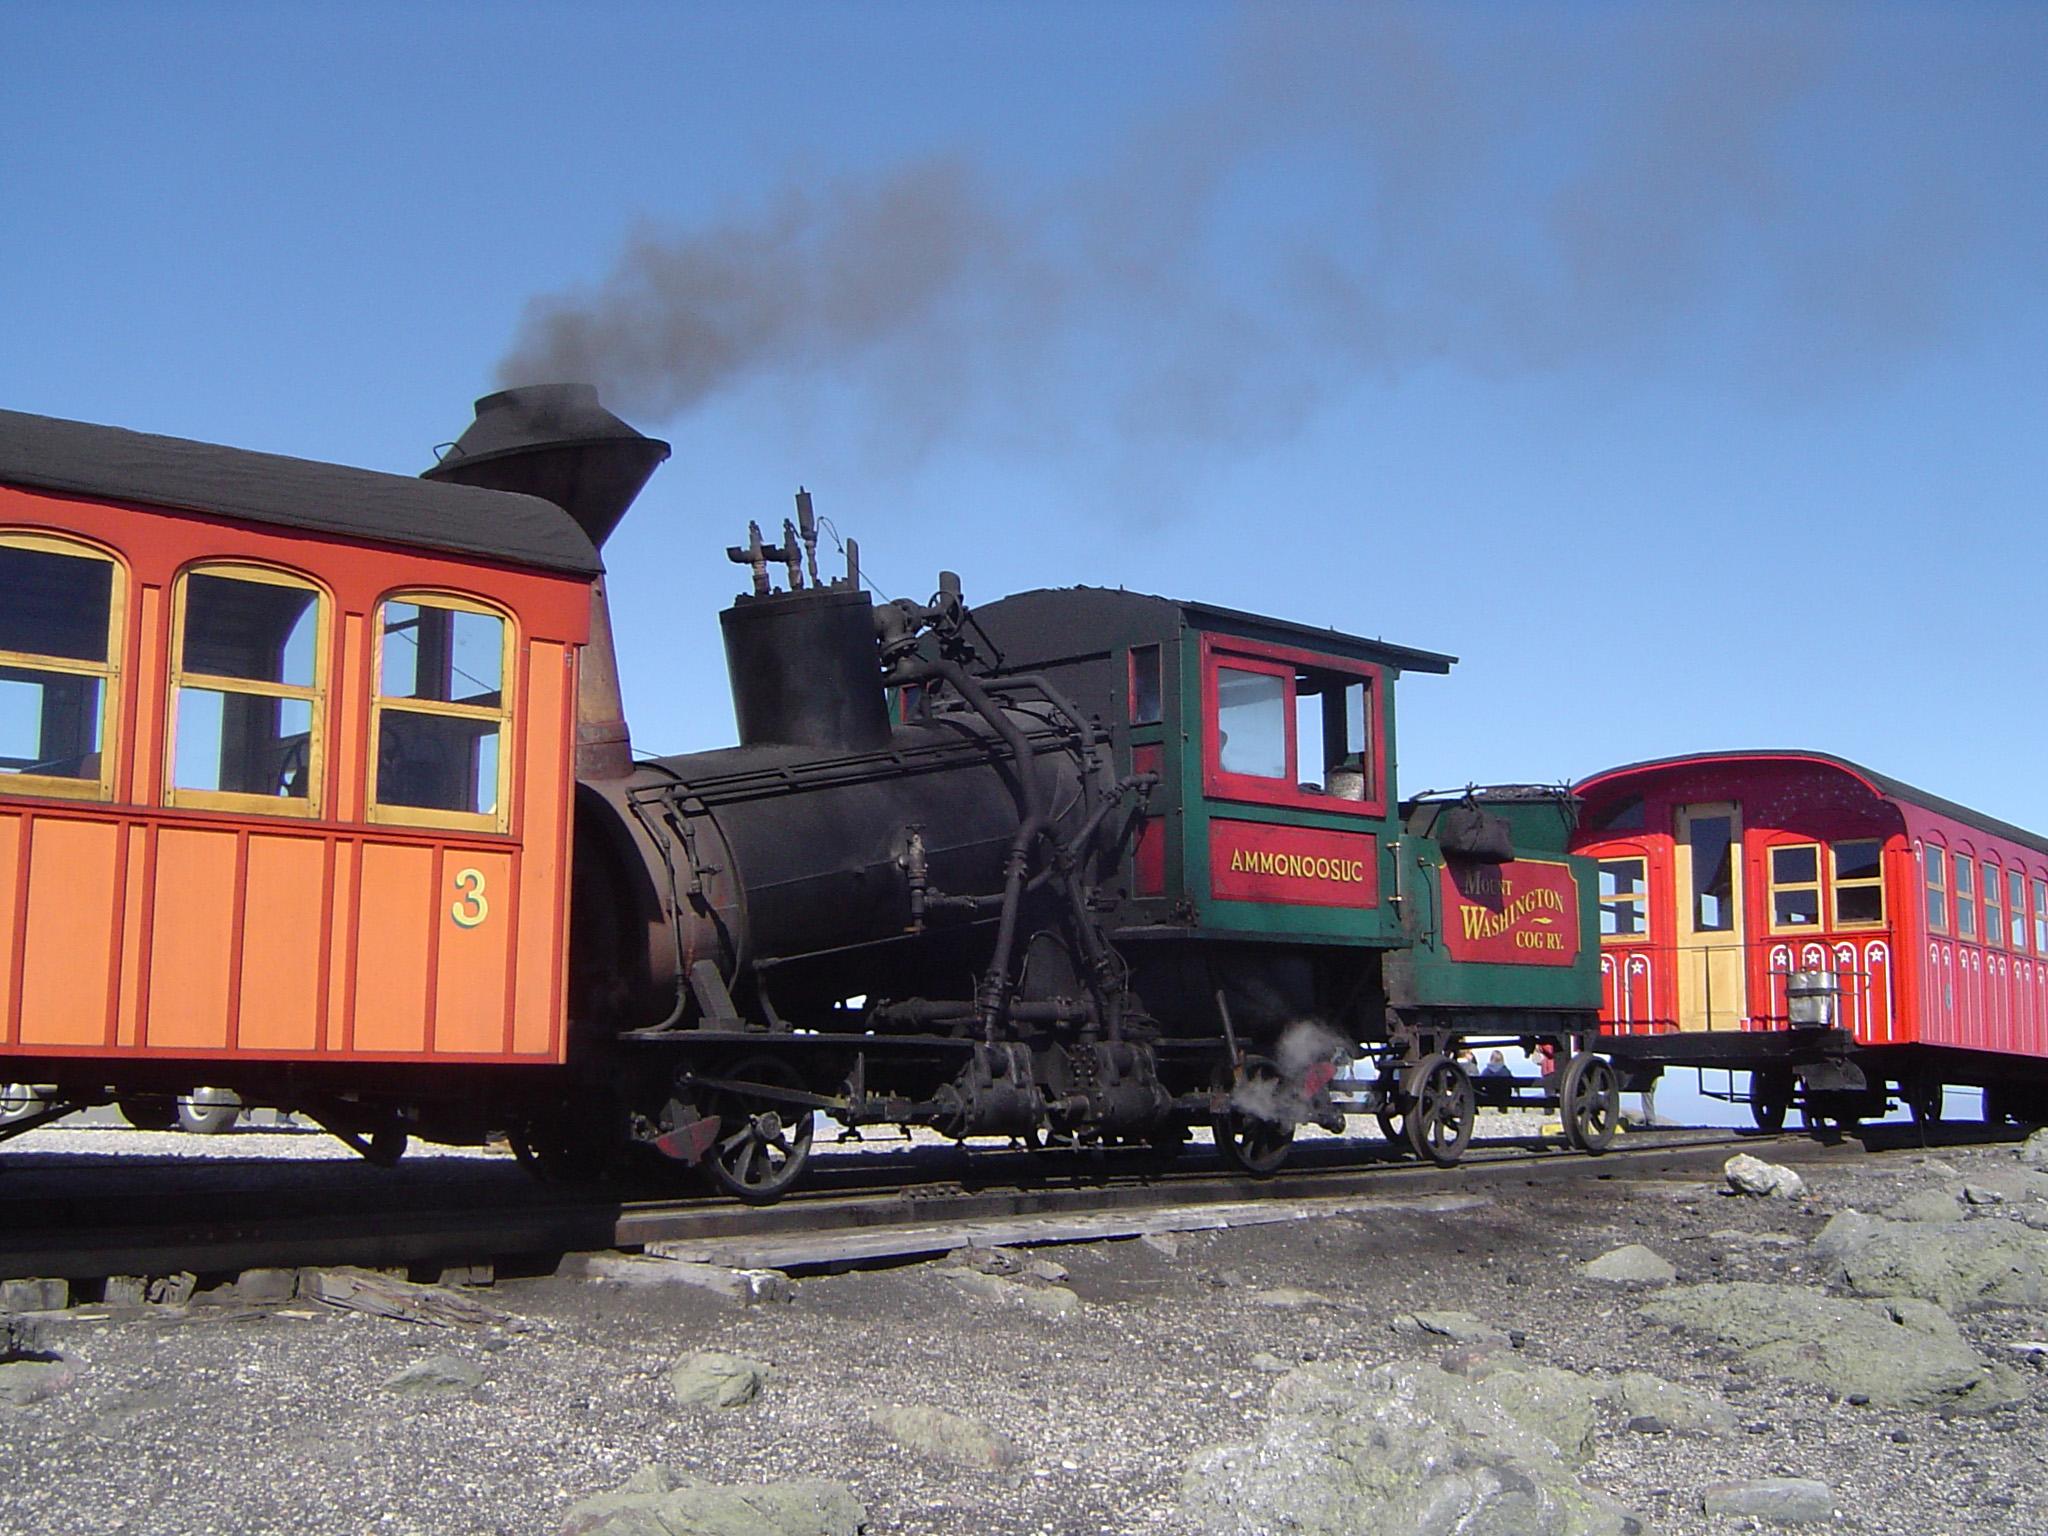 Free Stock photo of Vintage Locomotive on Cog Railway   Photoeverywhere